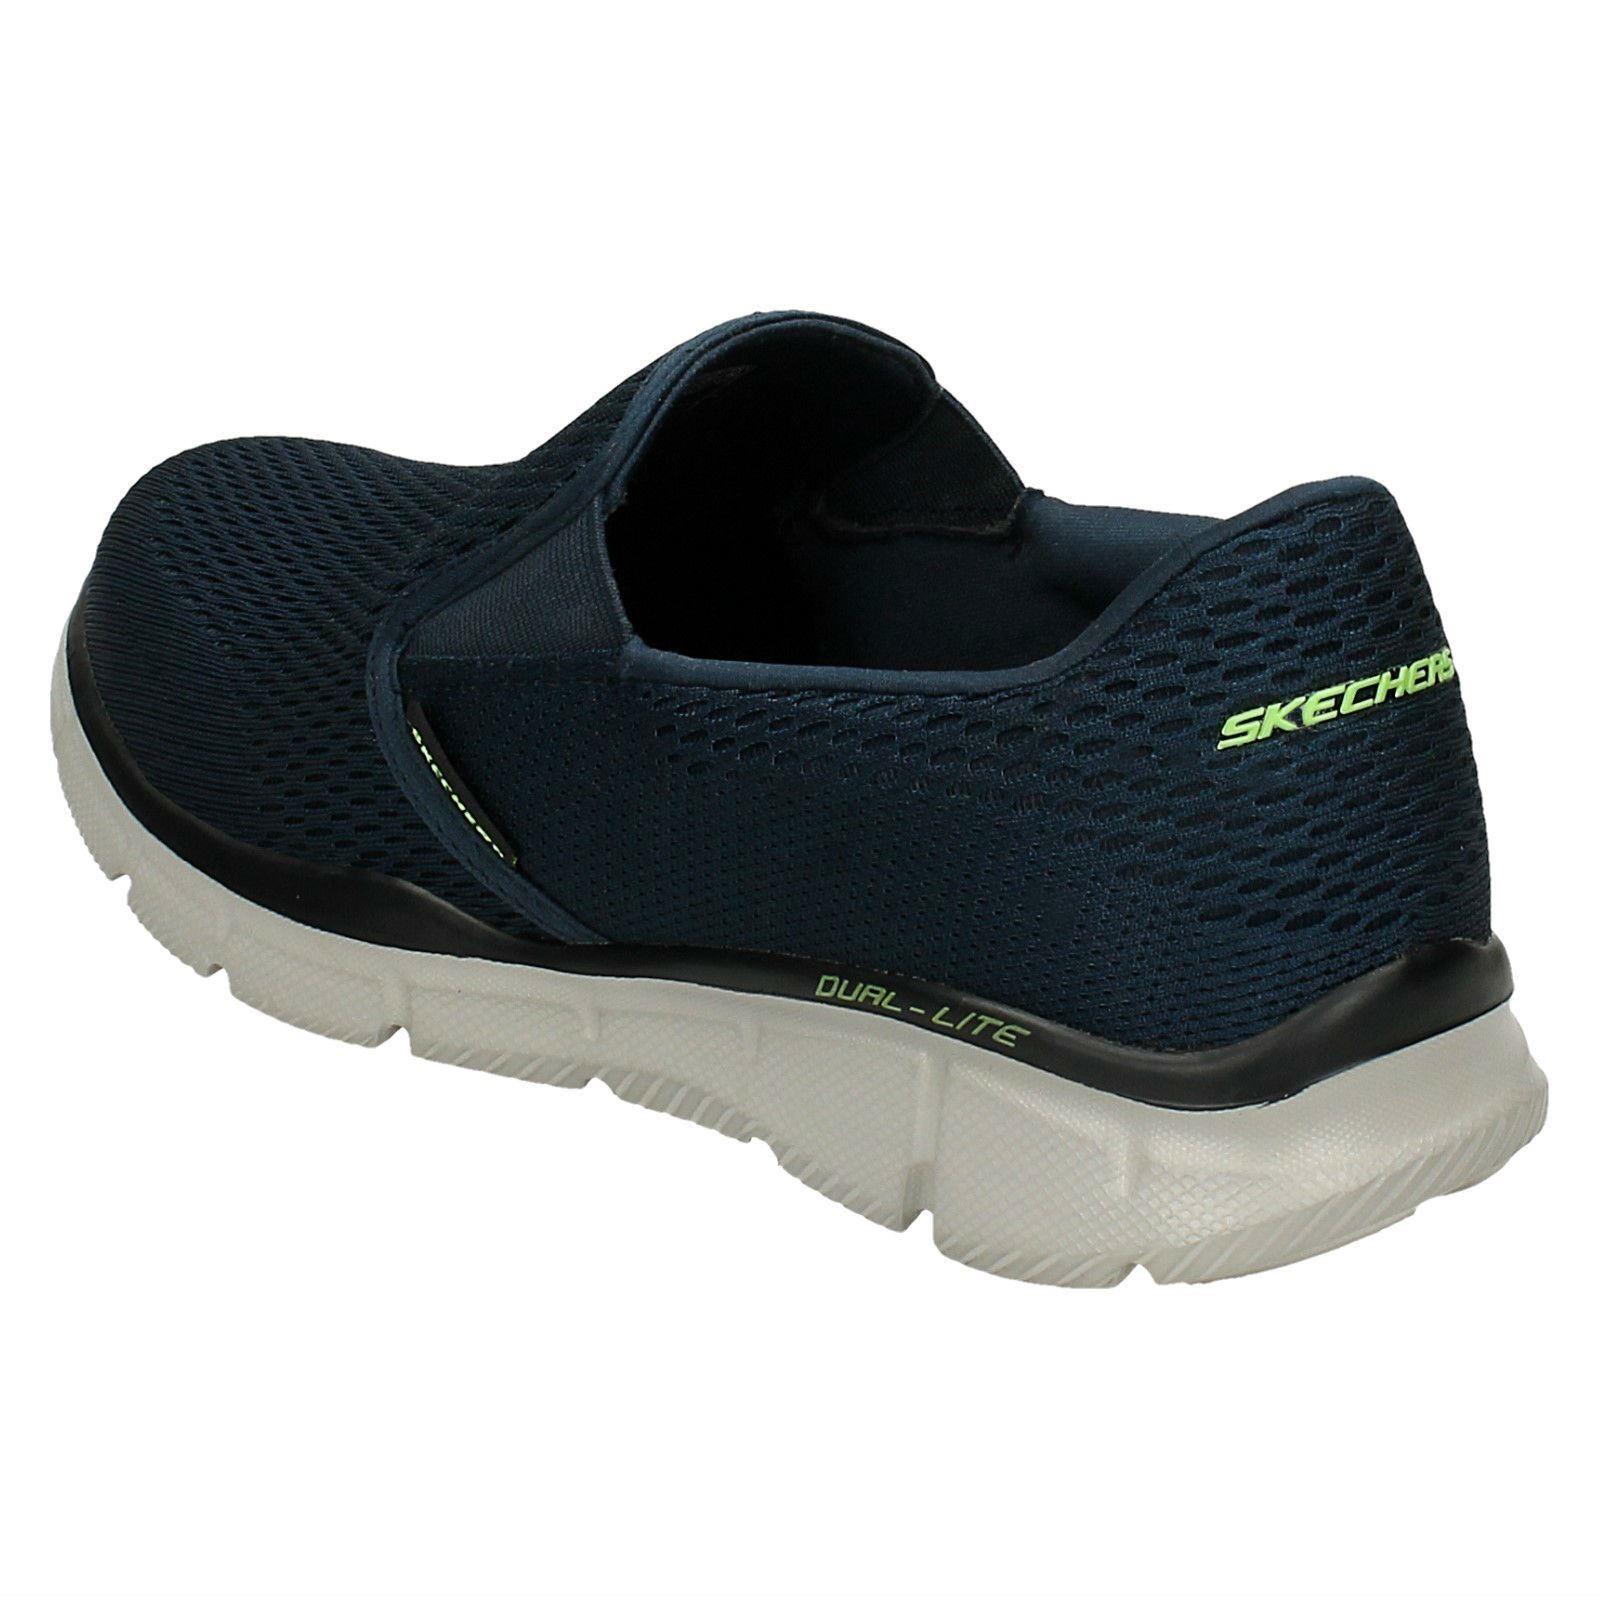 Detalles de Hombre Skechers Espuma Viscoelástica Zapatos para Andar Double Play